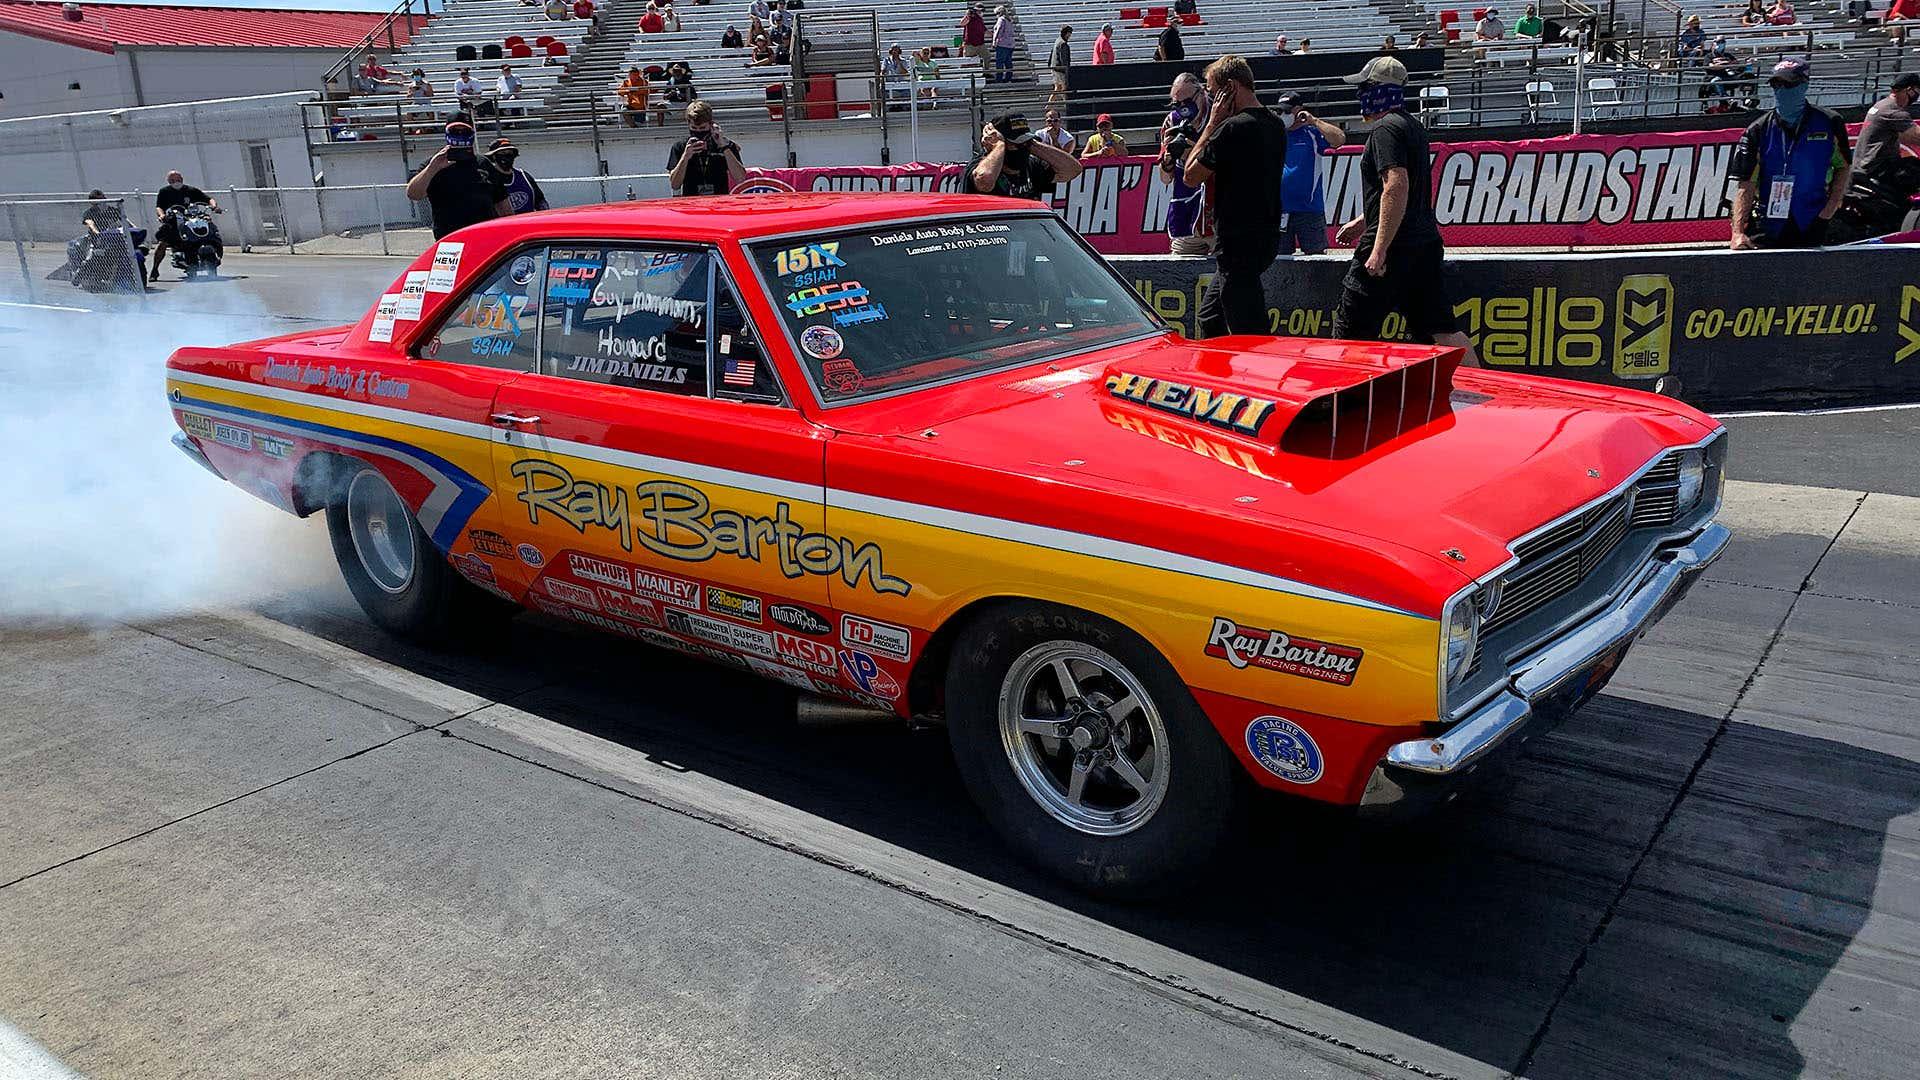 Ray Barton's Hemi drag racer.